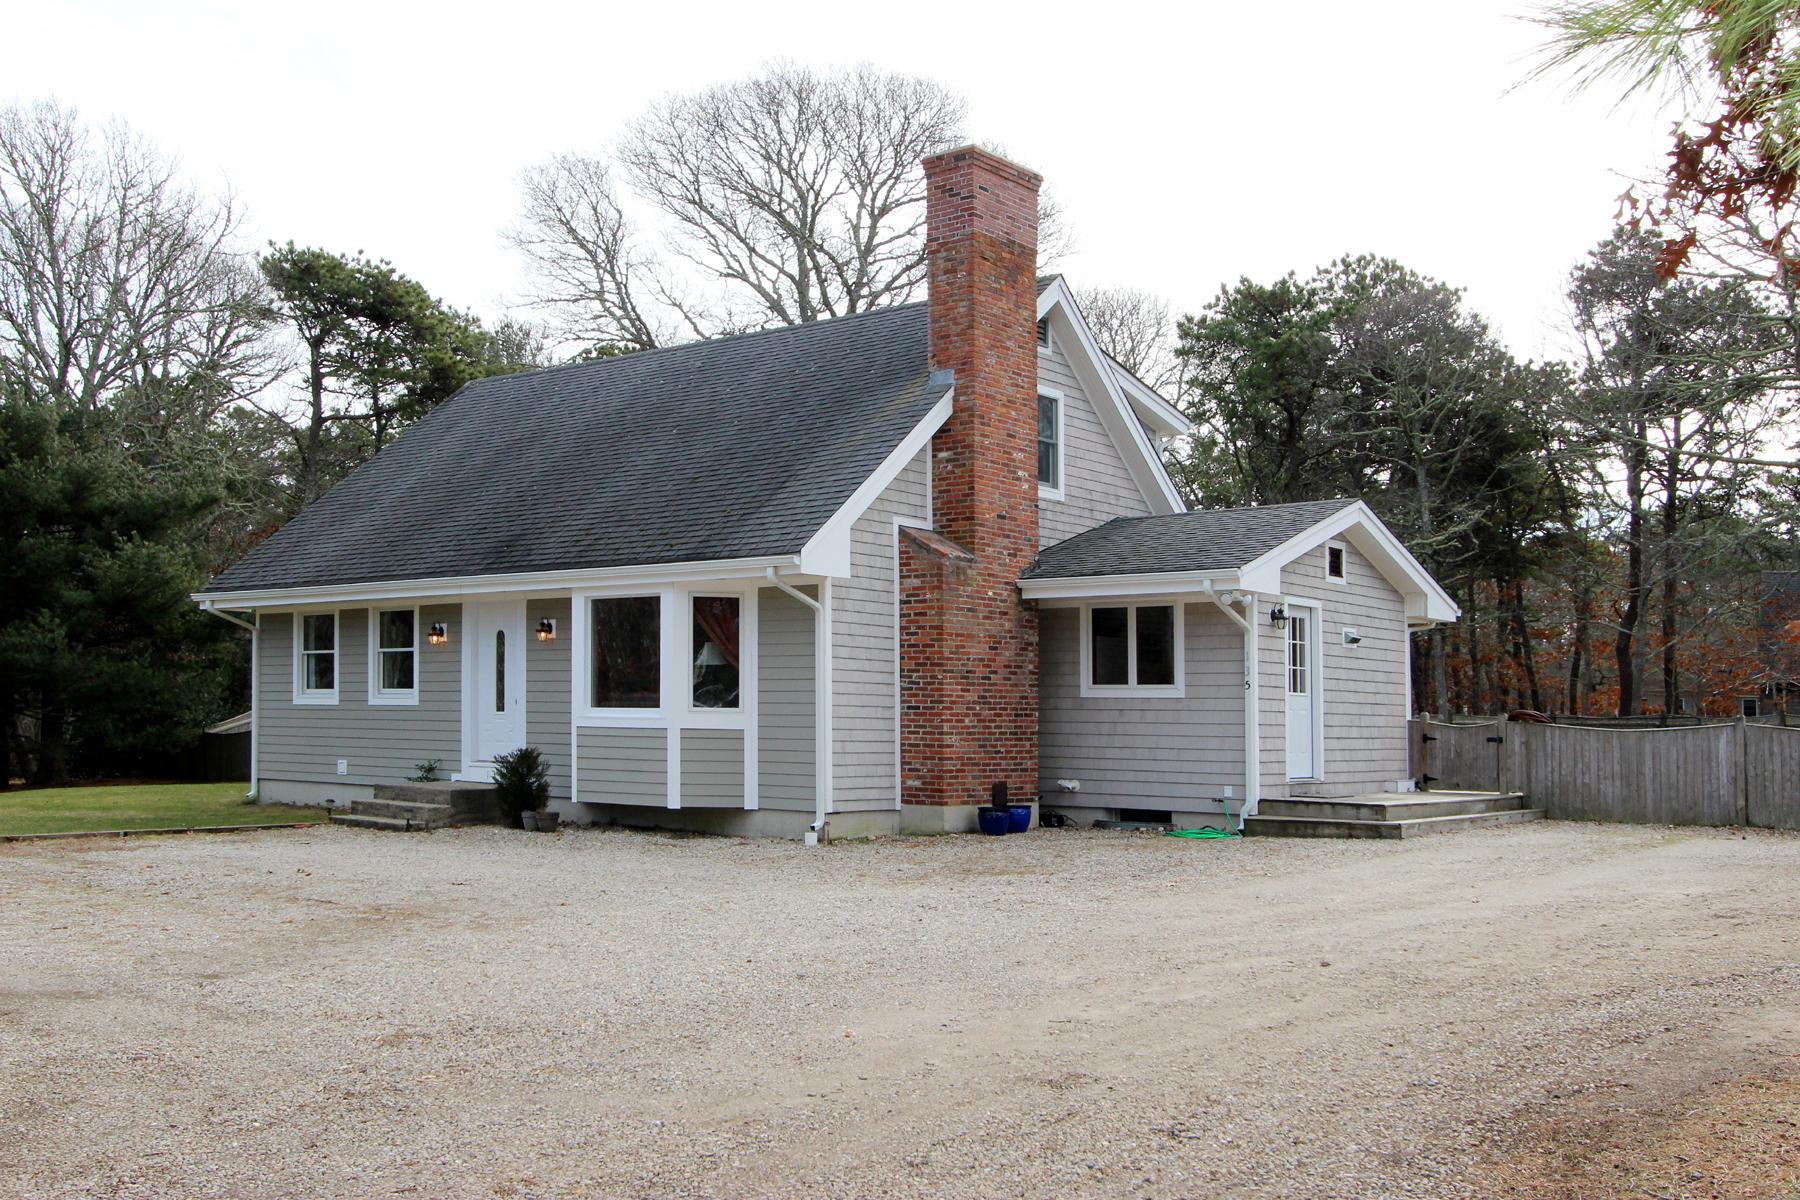 Single Family Homes για την Πώληση στο 135 Circle Drive, Eastham, MA 02642 Eastham, Μασαχουσετη 02642 Ηνωμένες Πολιτείες